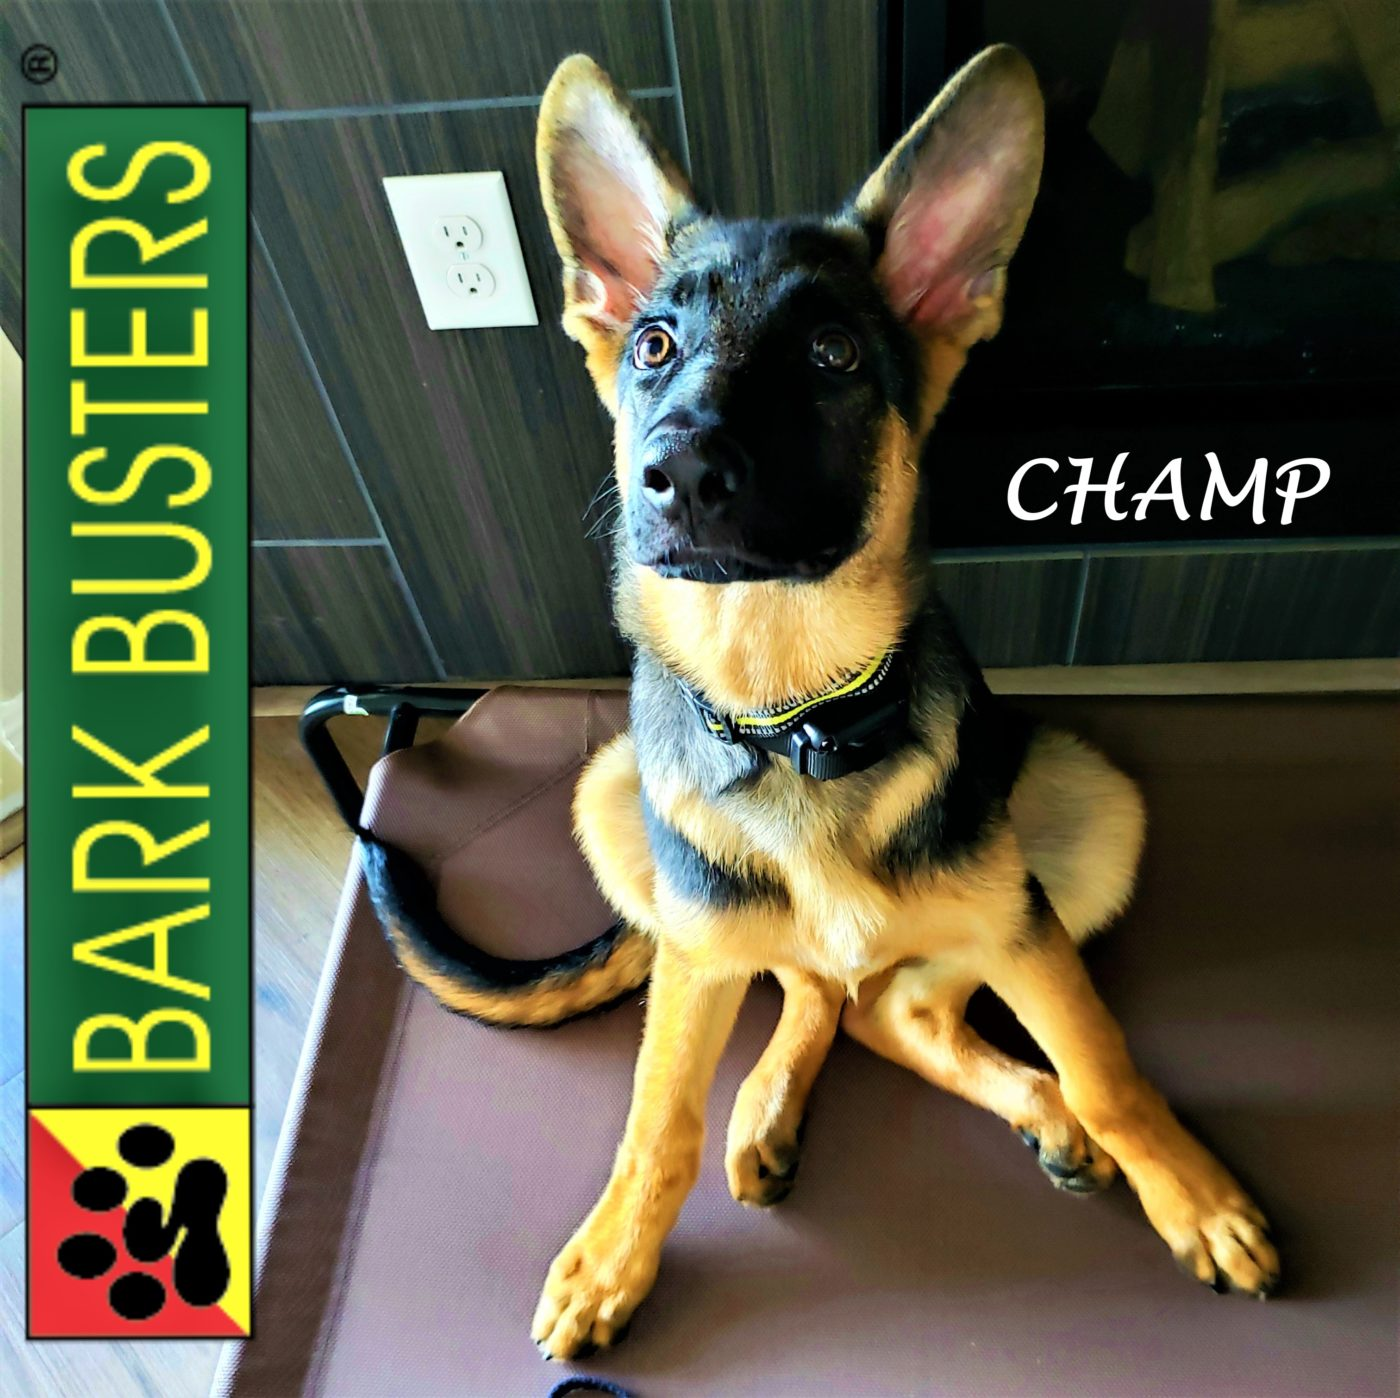 #germanshepherd #puppytraining #dogtrainingaustin #dogtrainernearme #speakdog #barkbusters #inhomedogtraining